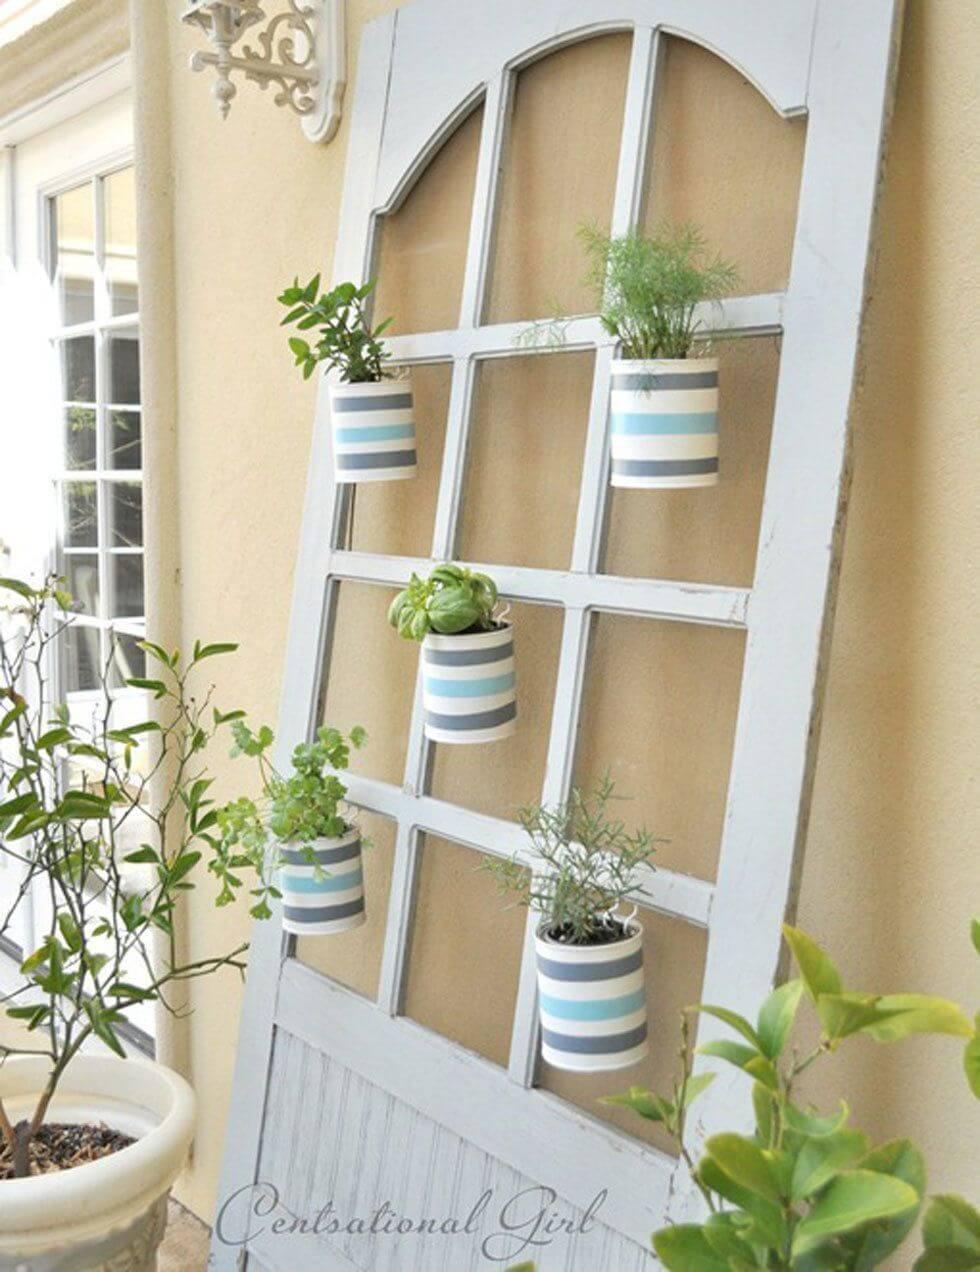 Hang Herb Pots in the Windows